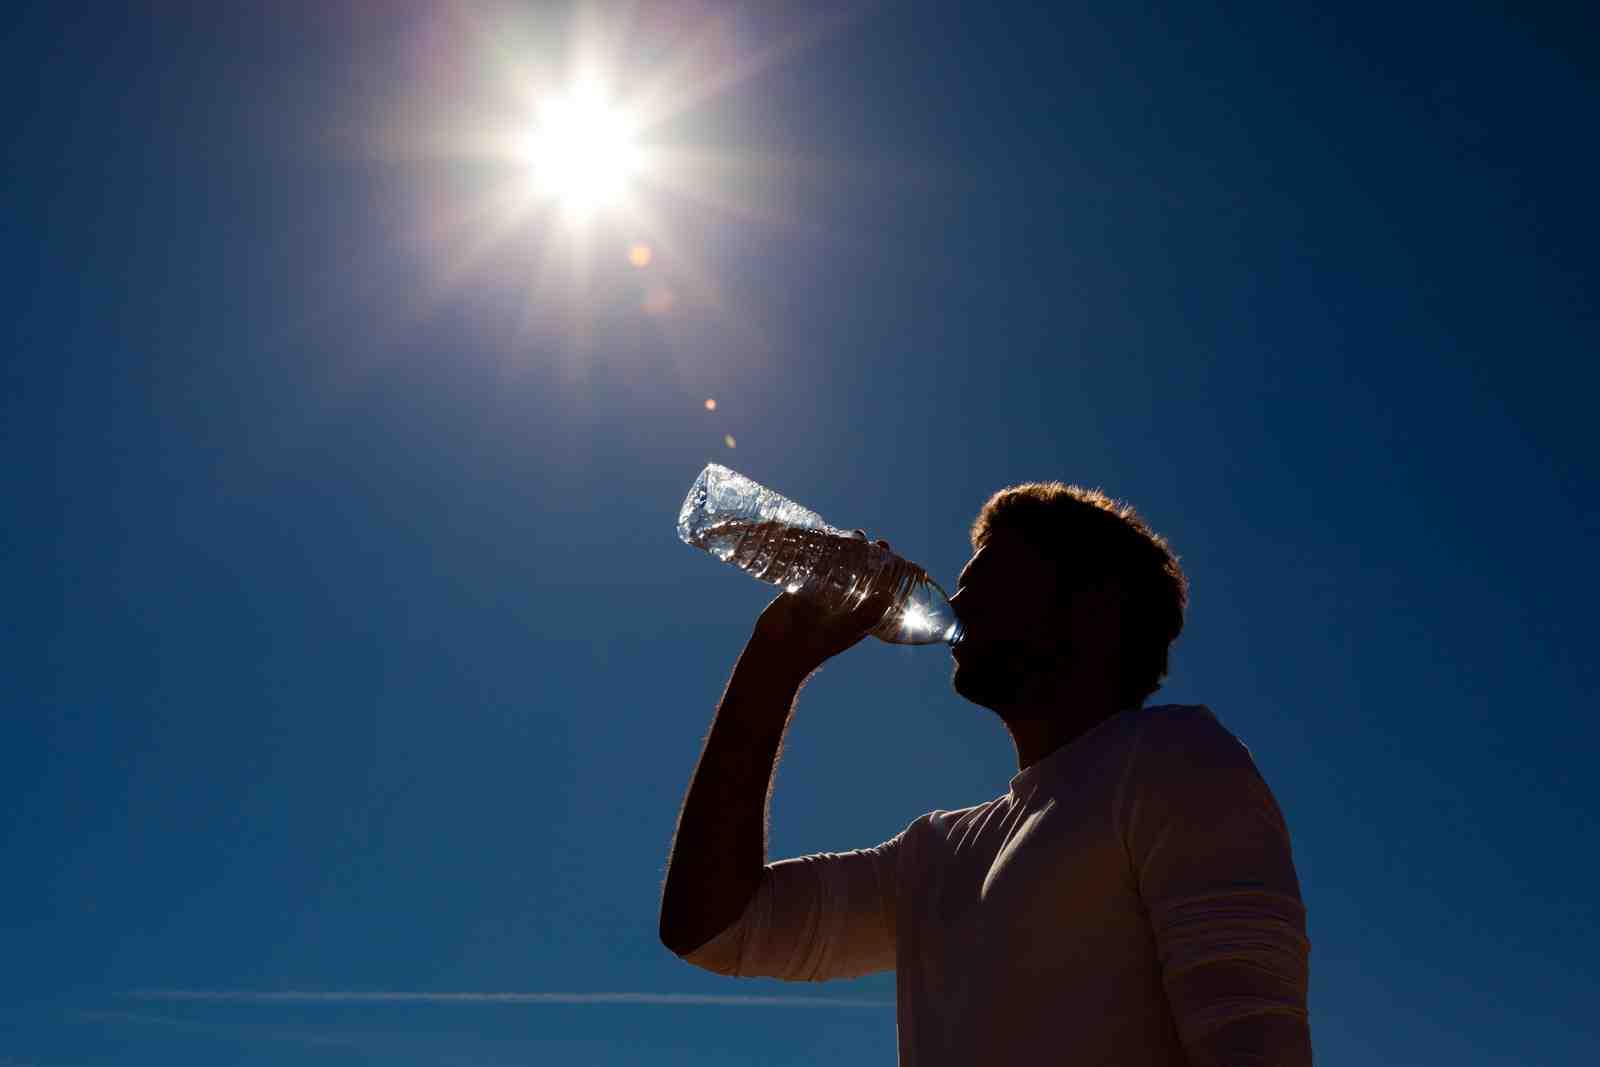 strok haba menyerang hendaklah banyak minum air